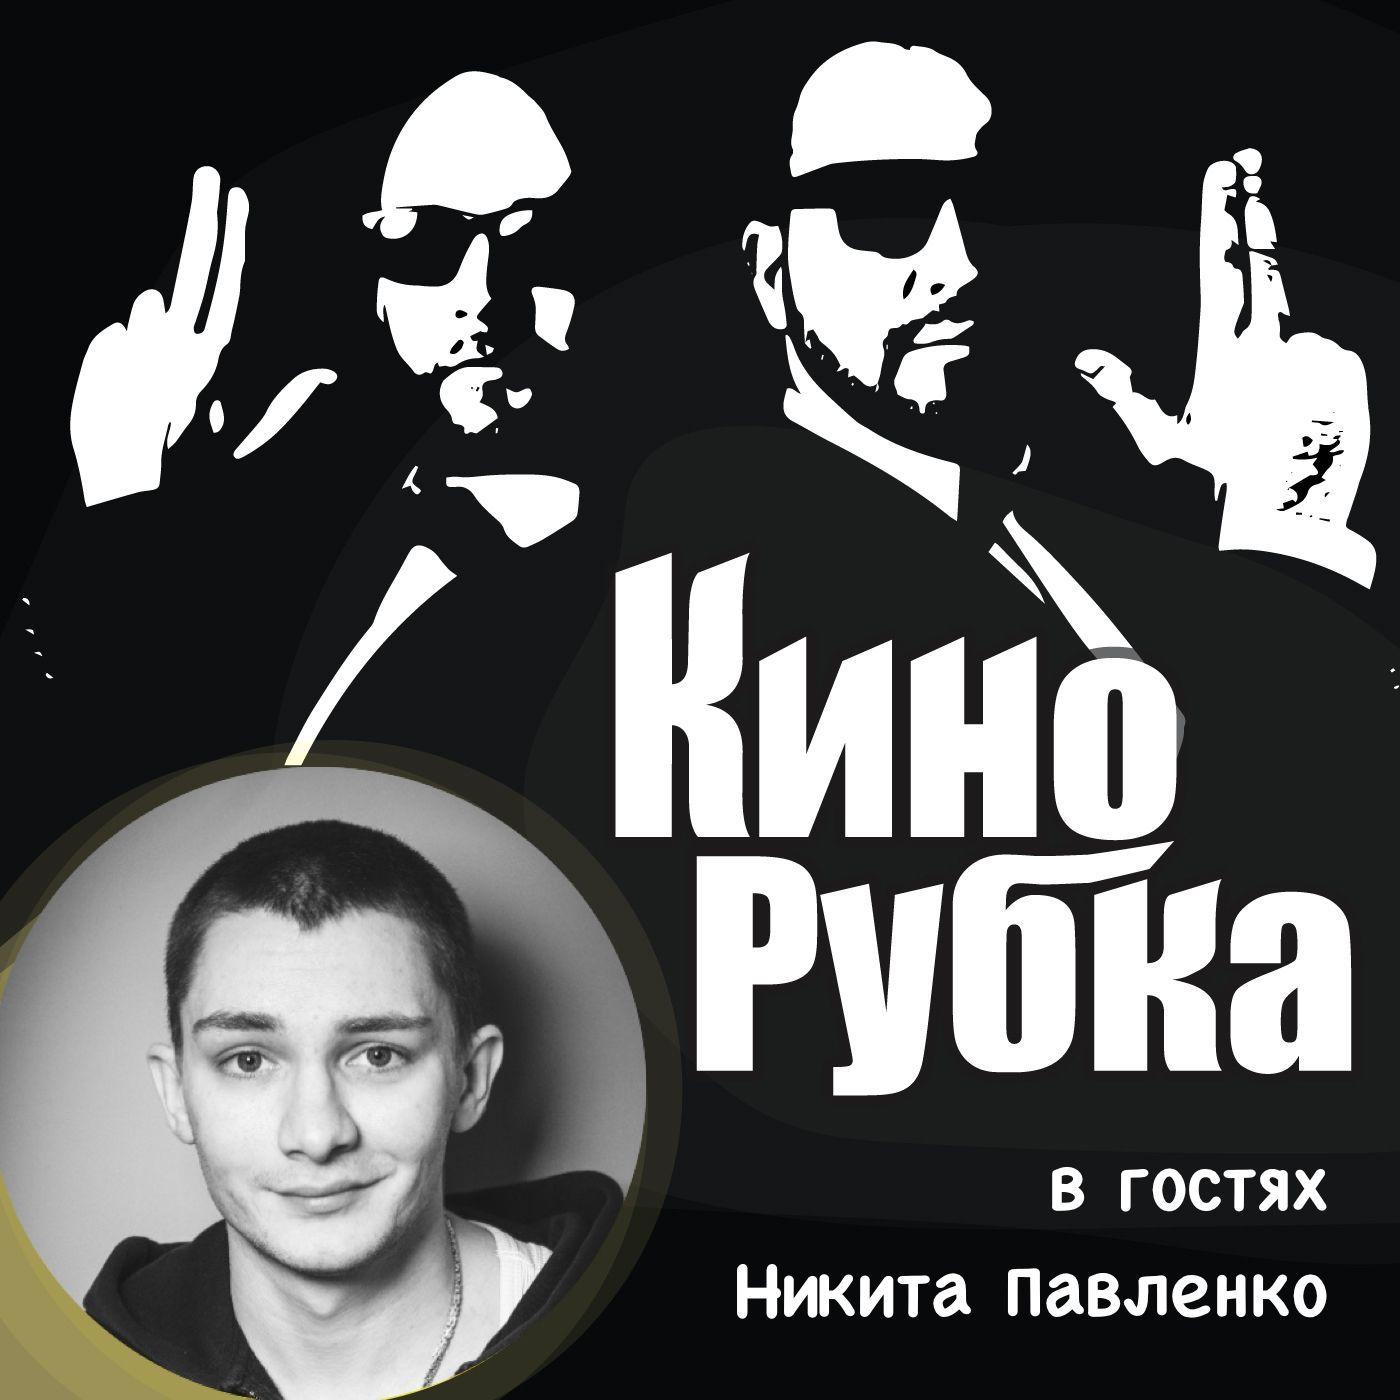 Павел Дикан Актер театра и кино Никита Павленко павел дикан актер театра и кино николай цонку